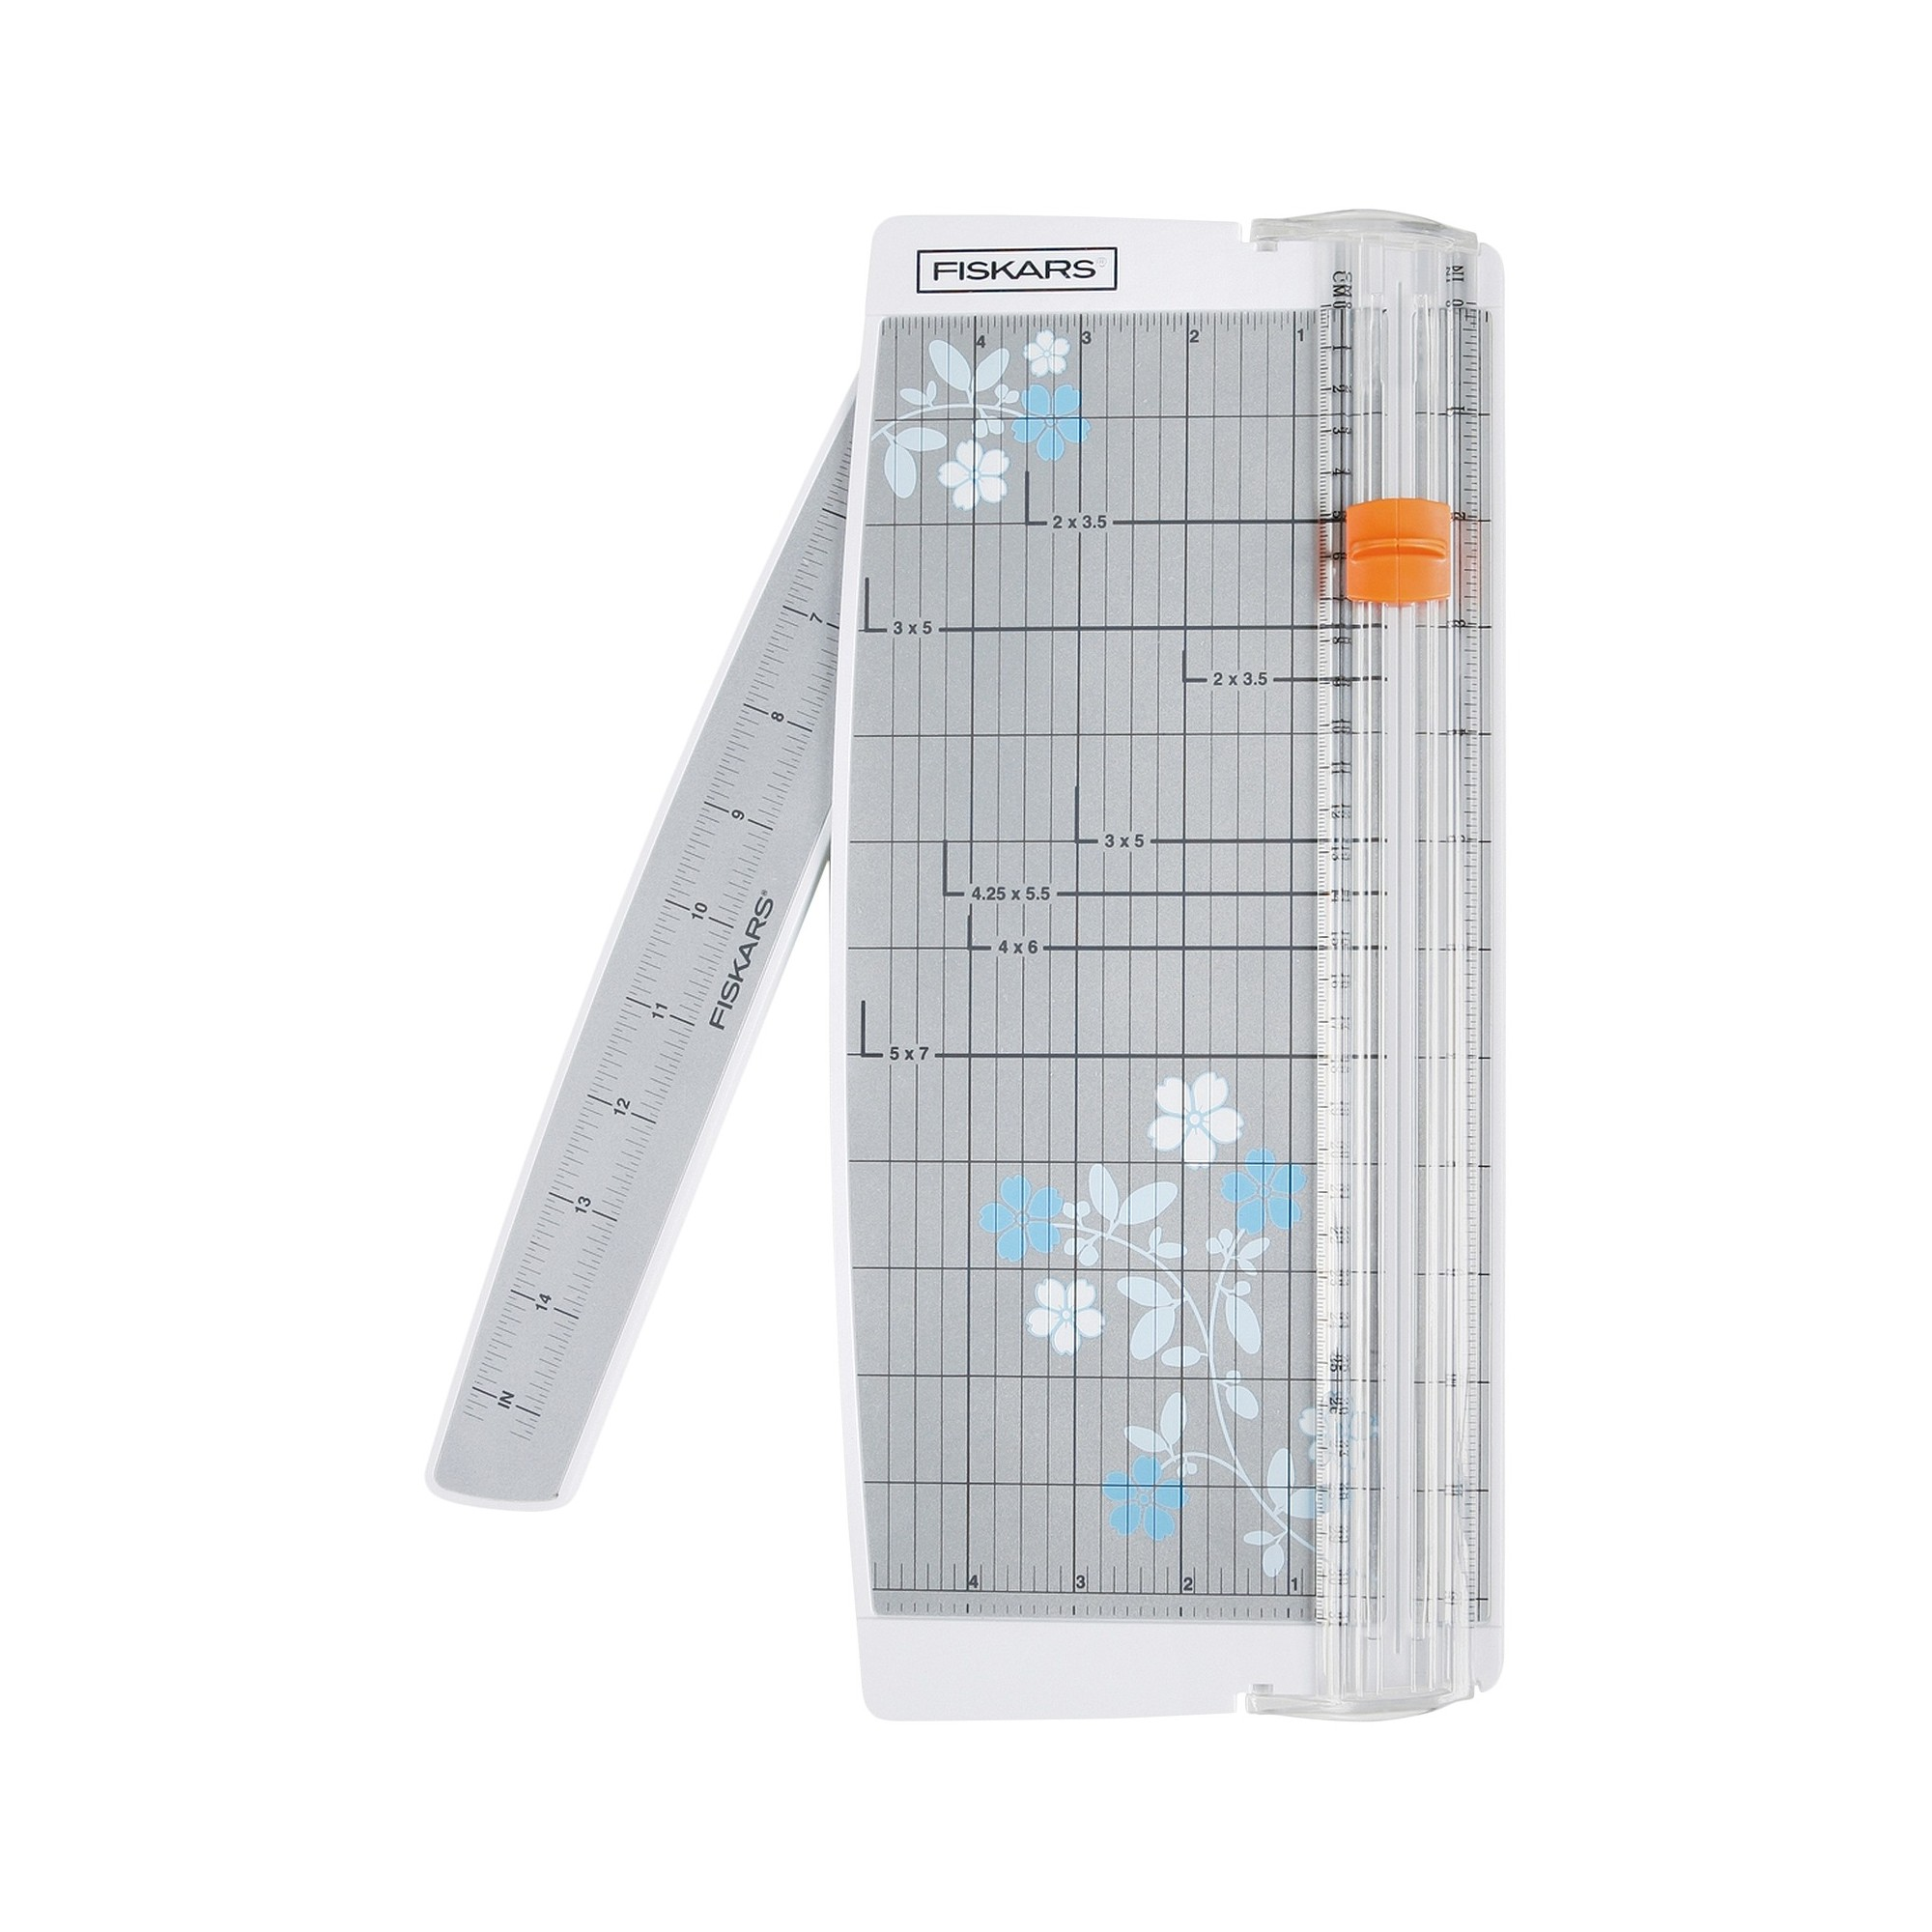 Fiskars Portable Paper Trimmer Gray